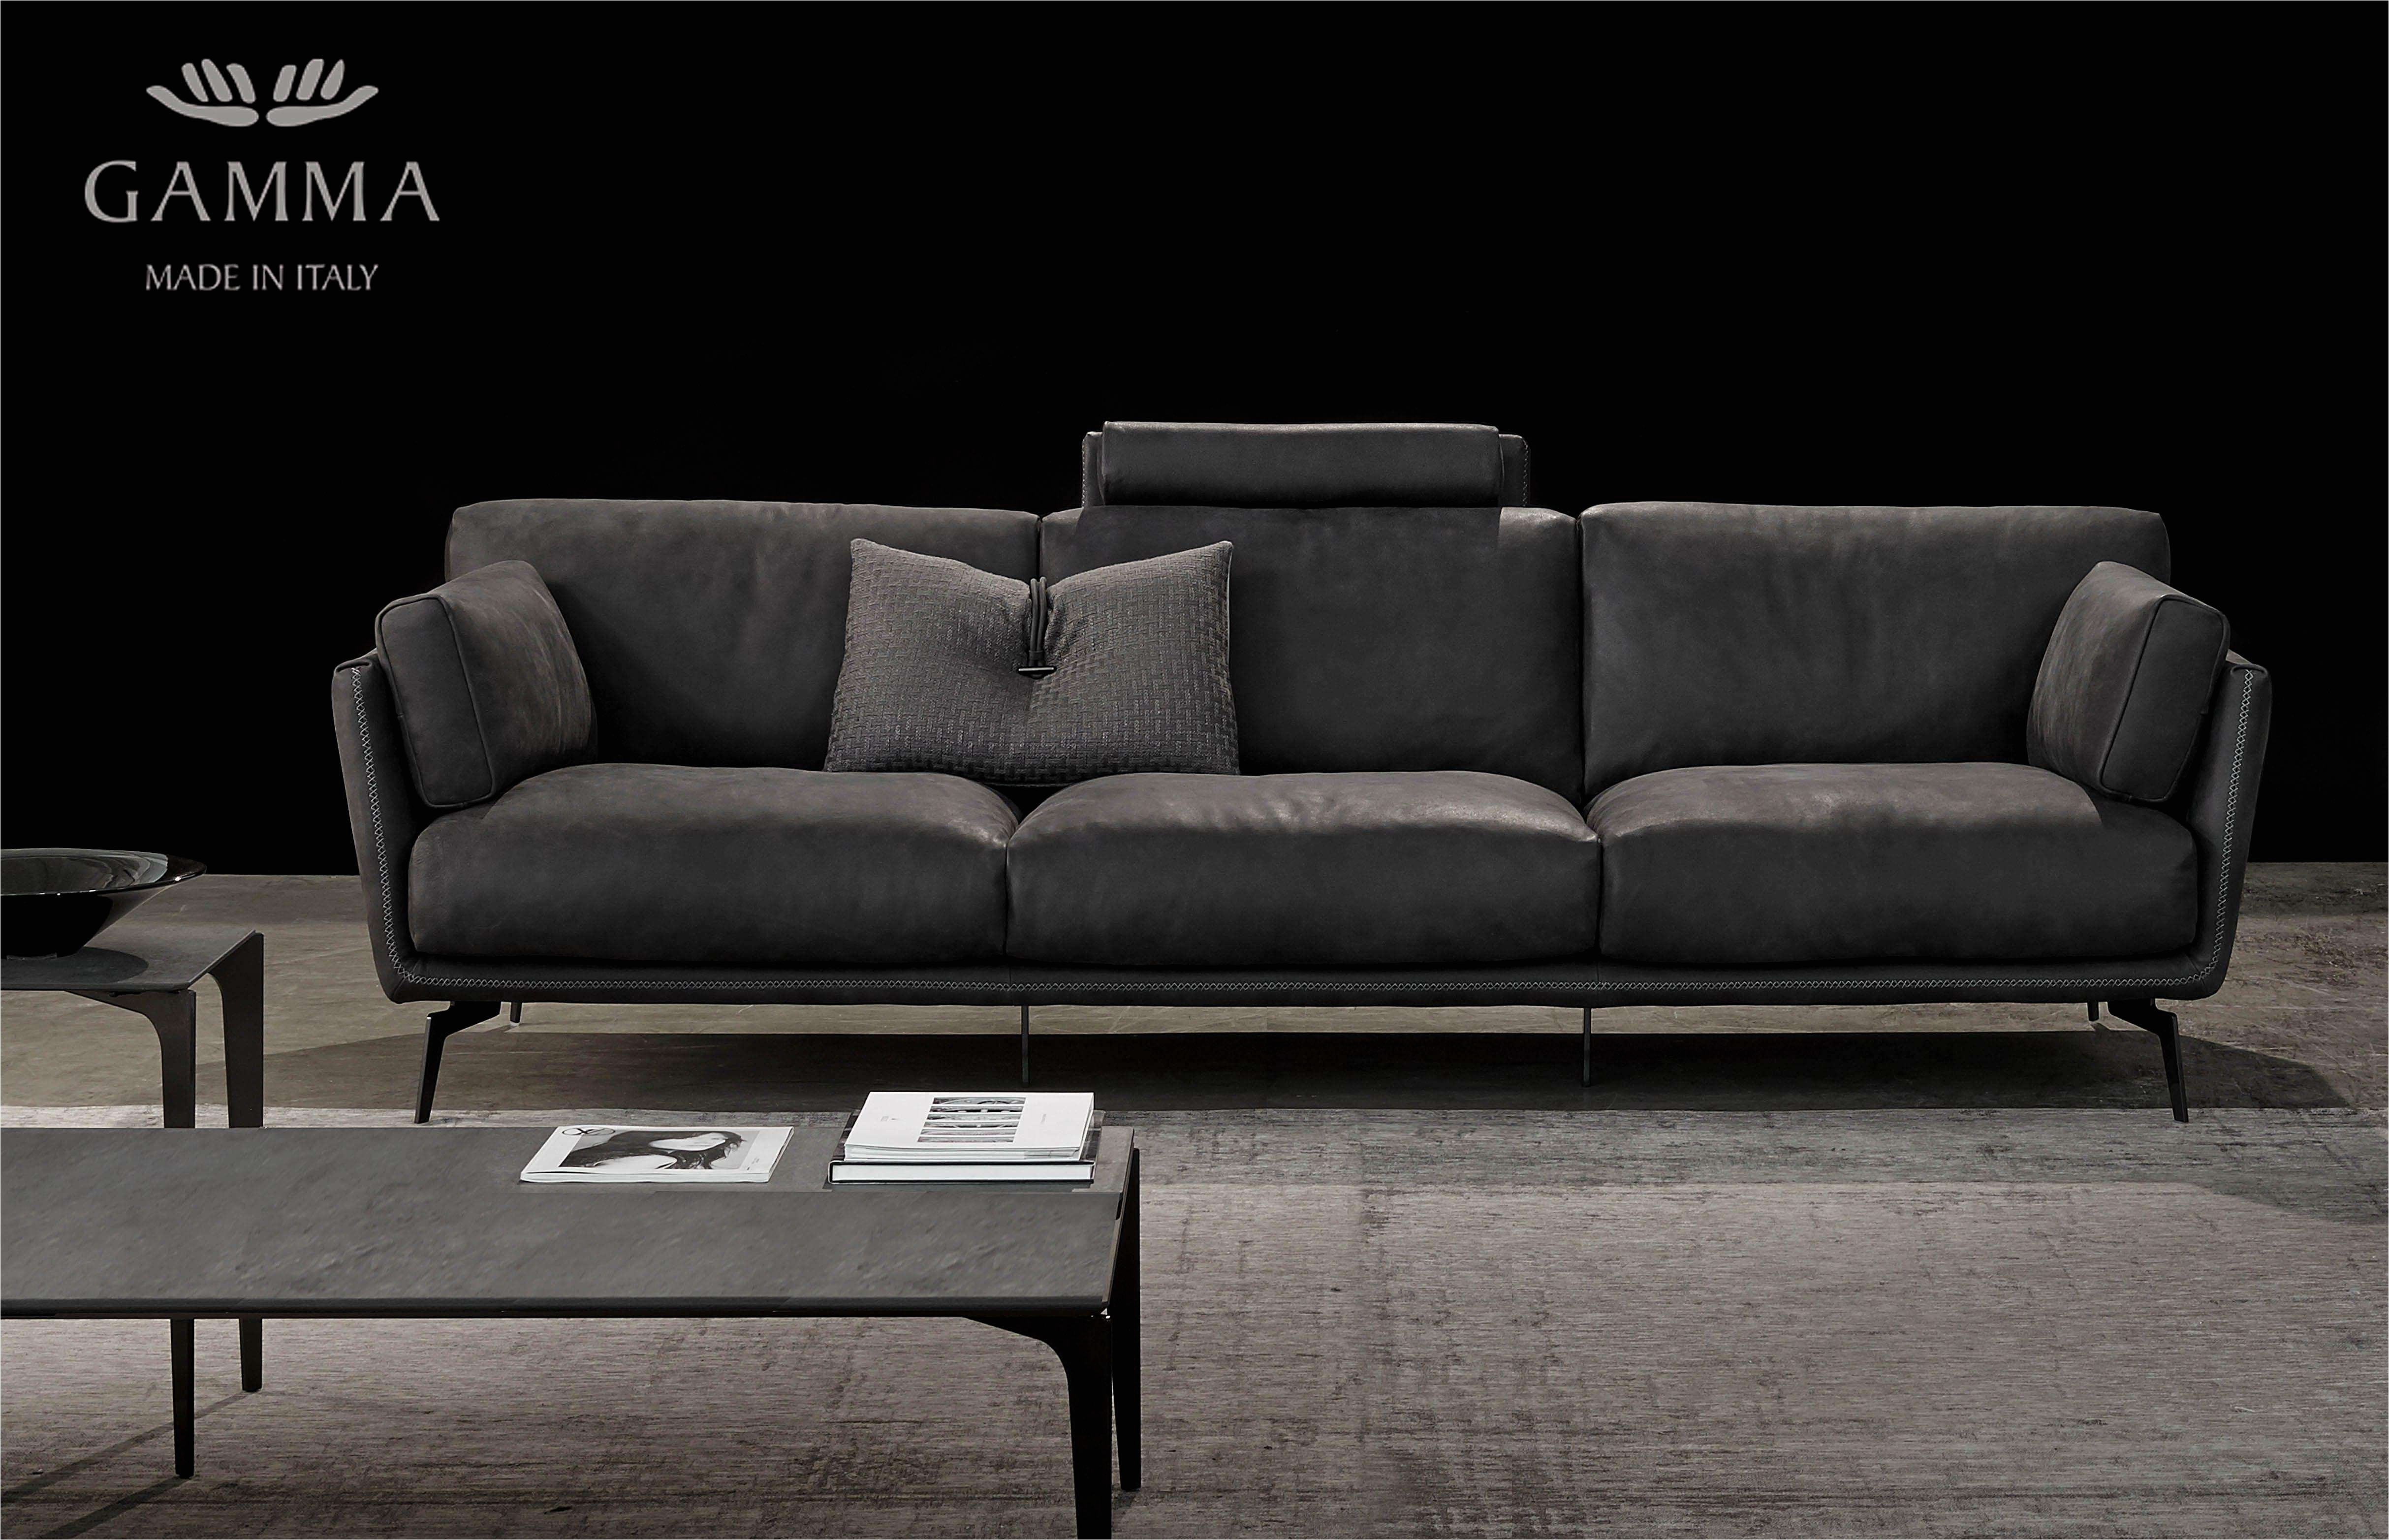 discount furniture charlotte nc fresh 28 gray fabric sectional sofa classic fabulous sectional sofa deals photograph